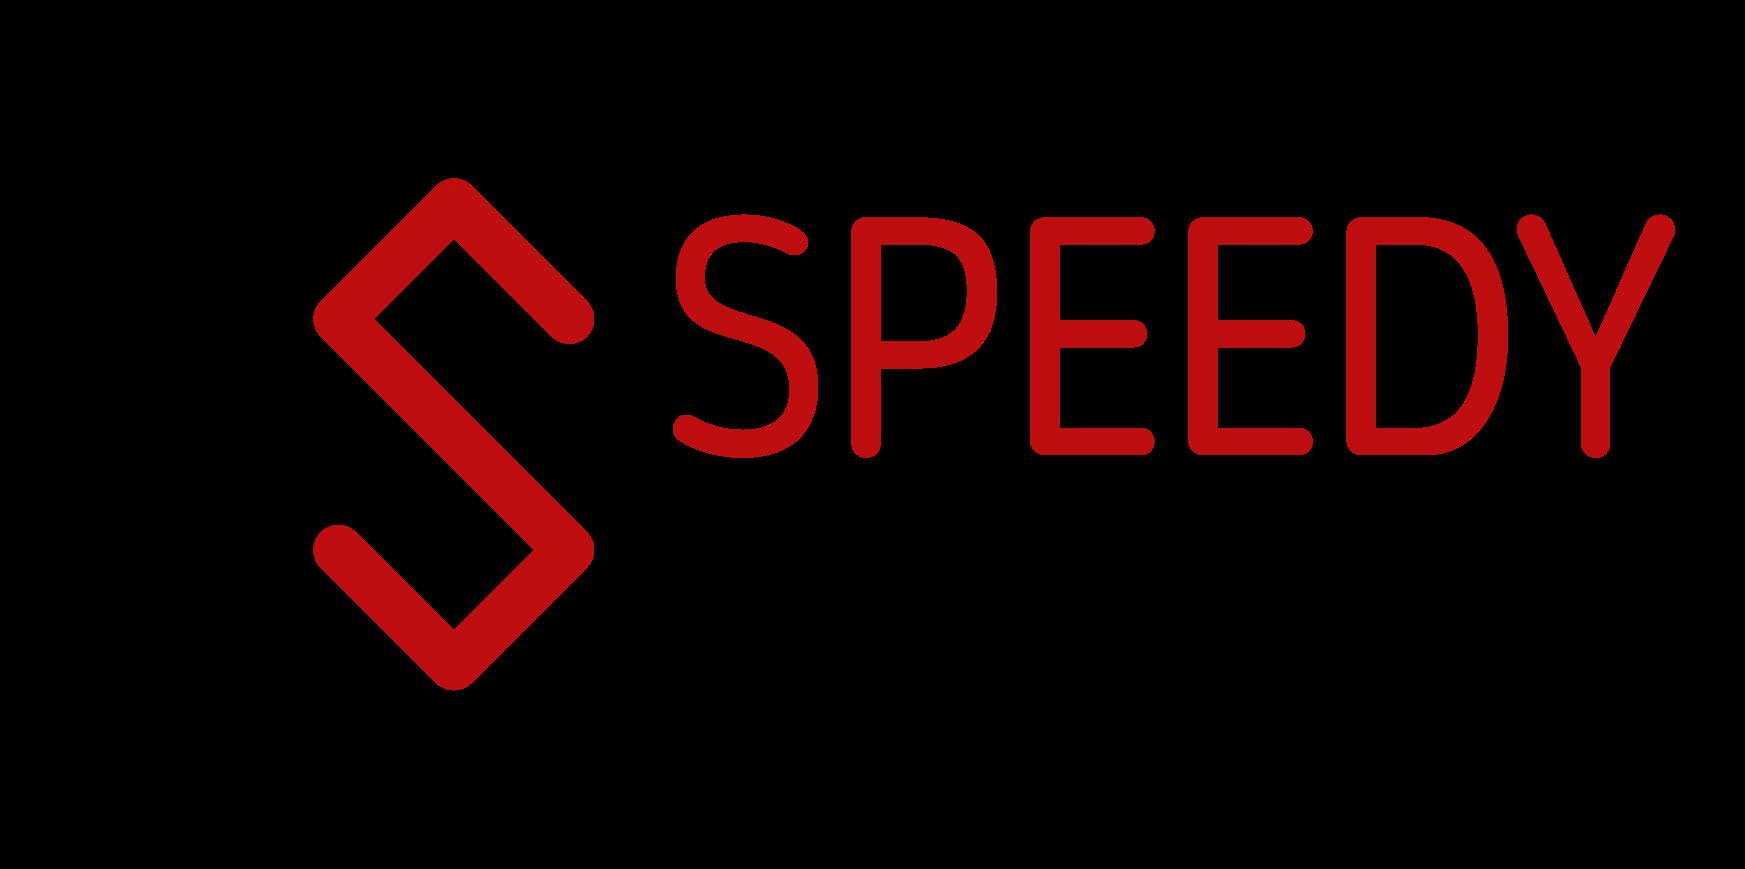 Speedy carrelage